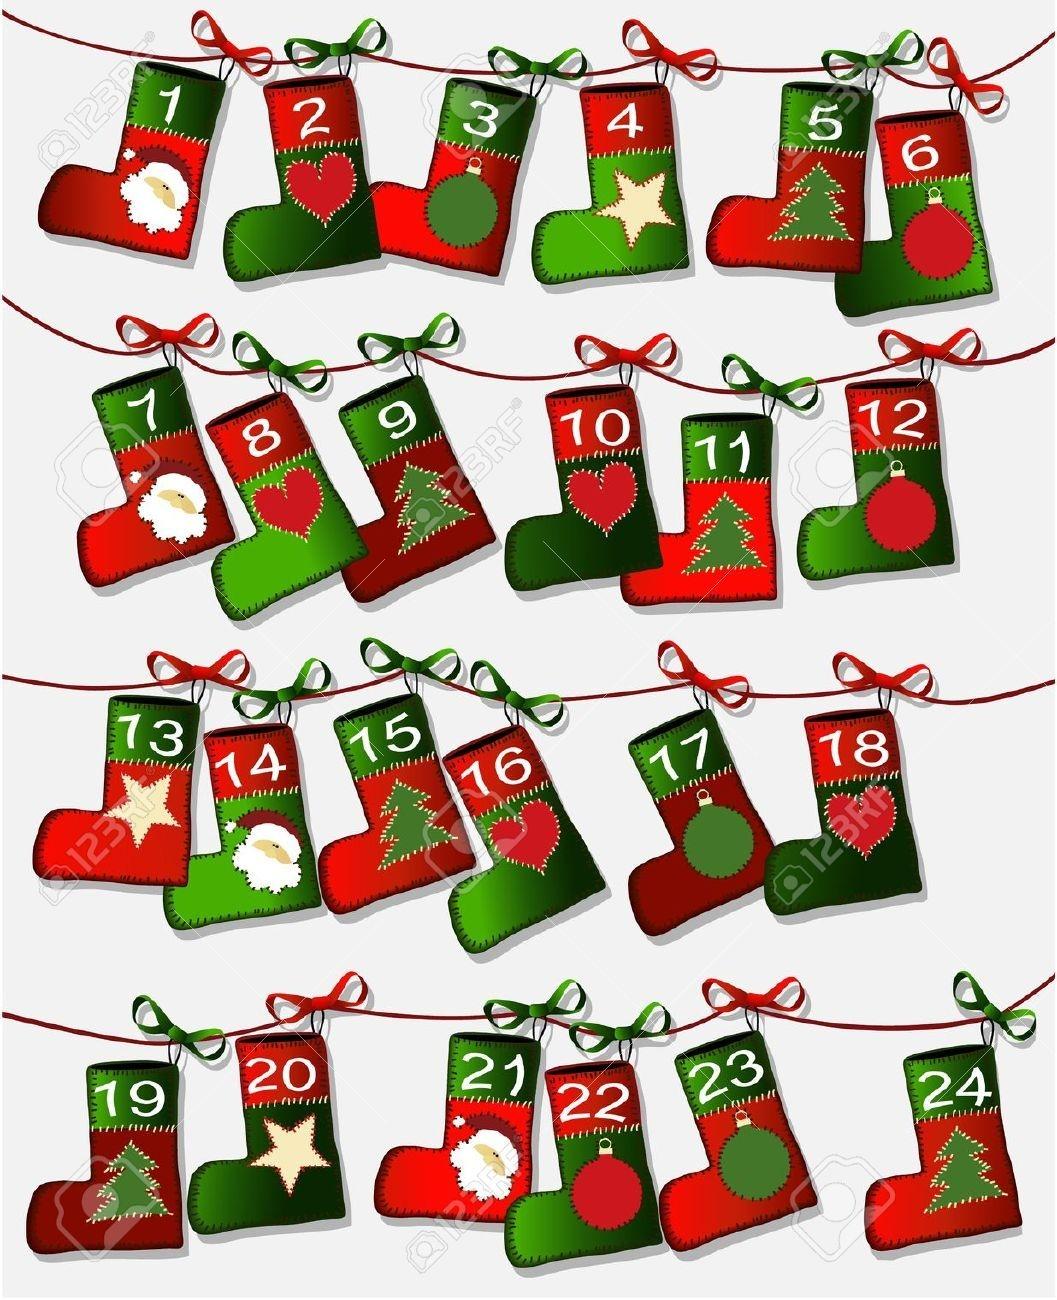 Free Countdown Cliparts, Download Free Clip Art, Free Clip